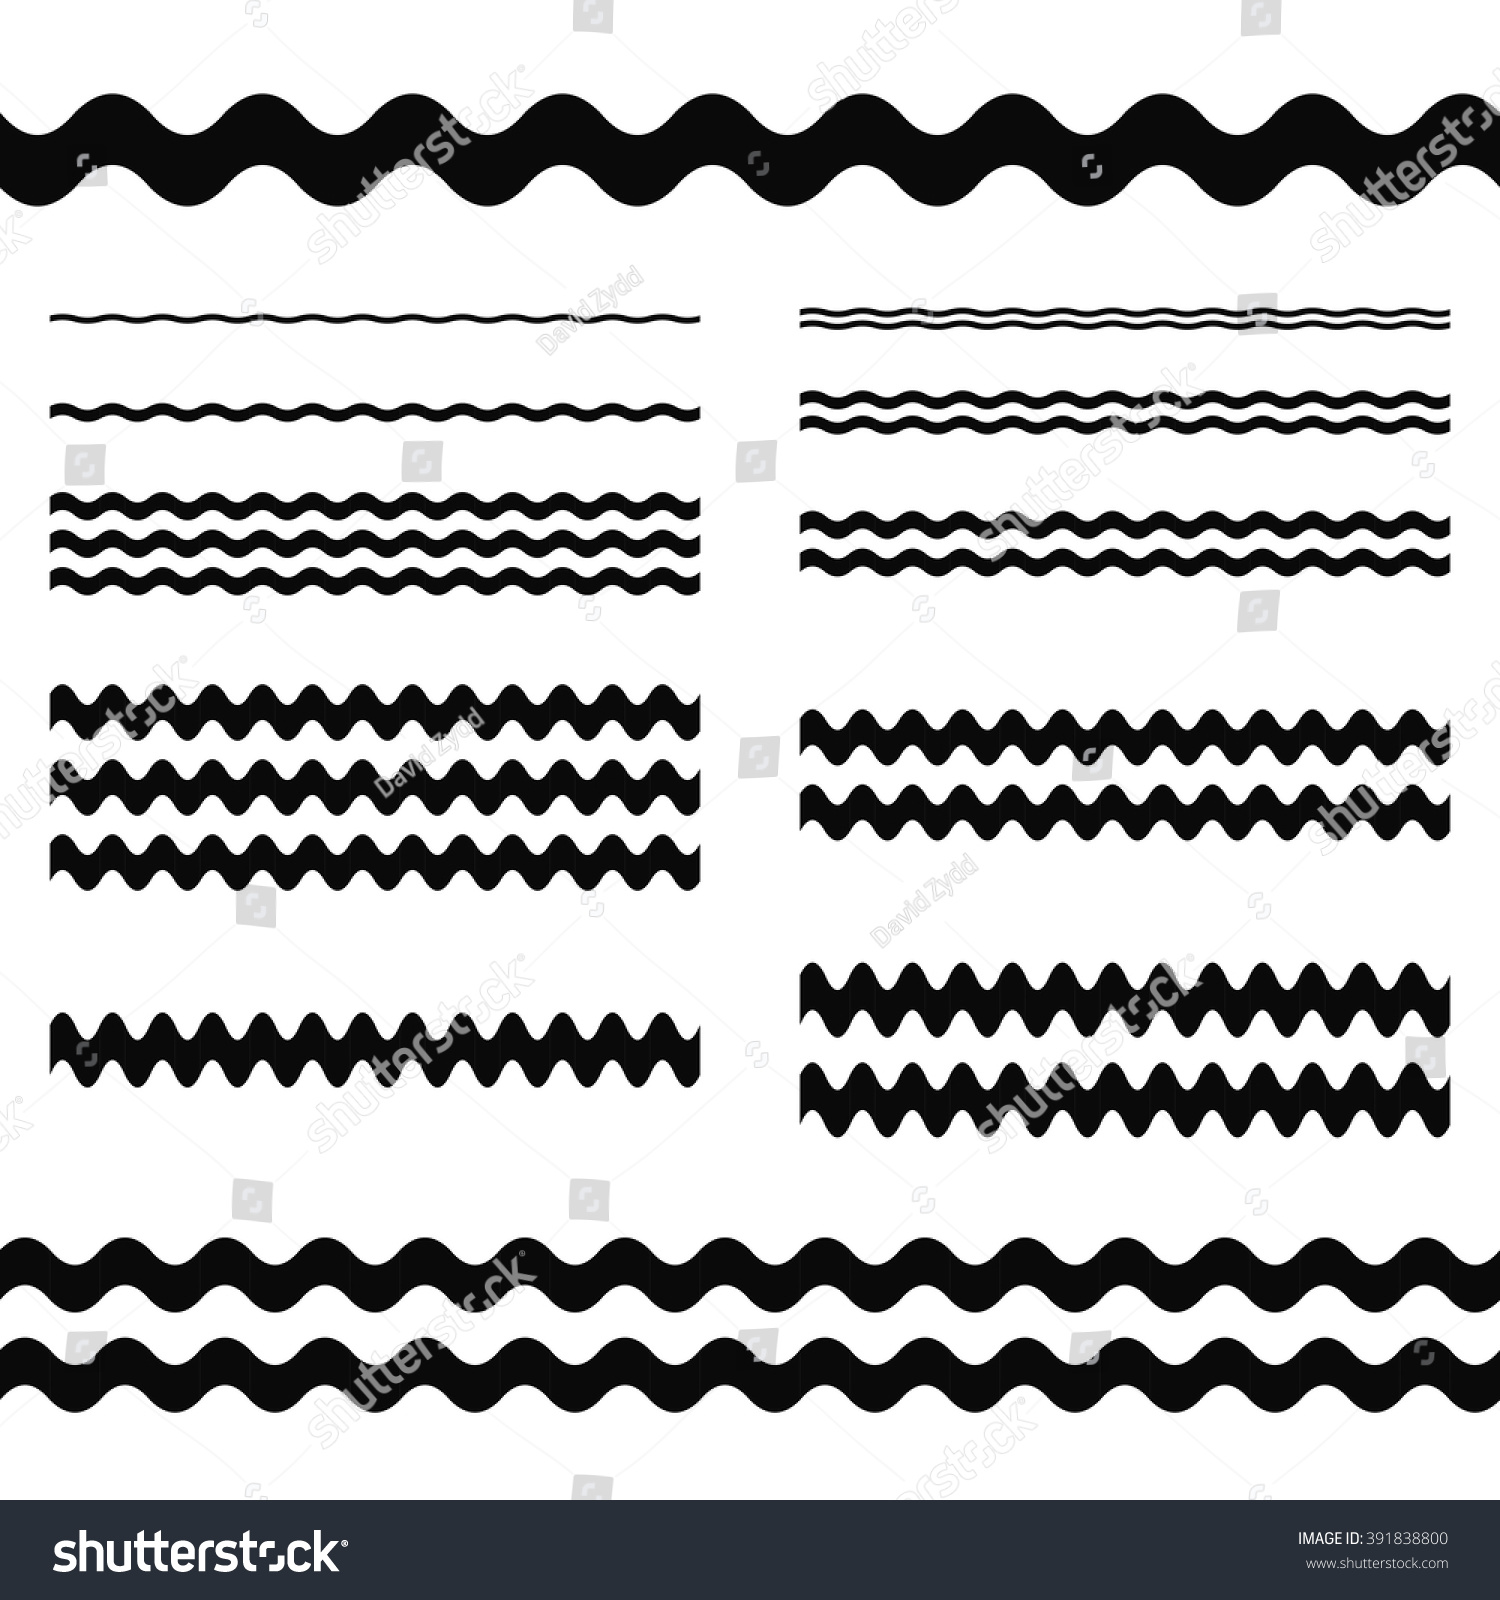 Graphic Design Elements Line : Graphic design elements wave line page stock vector